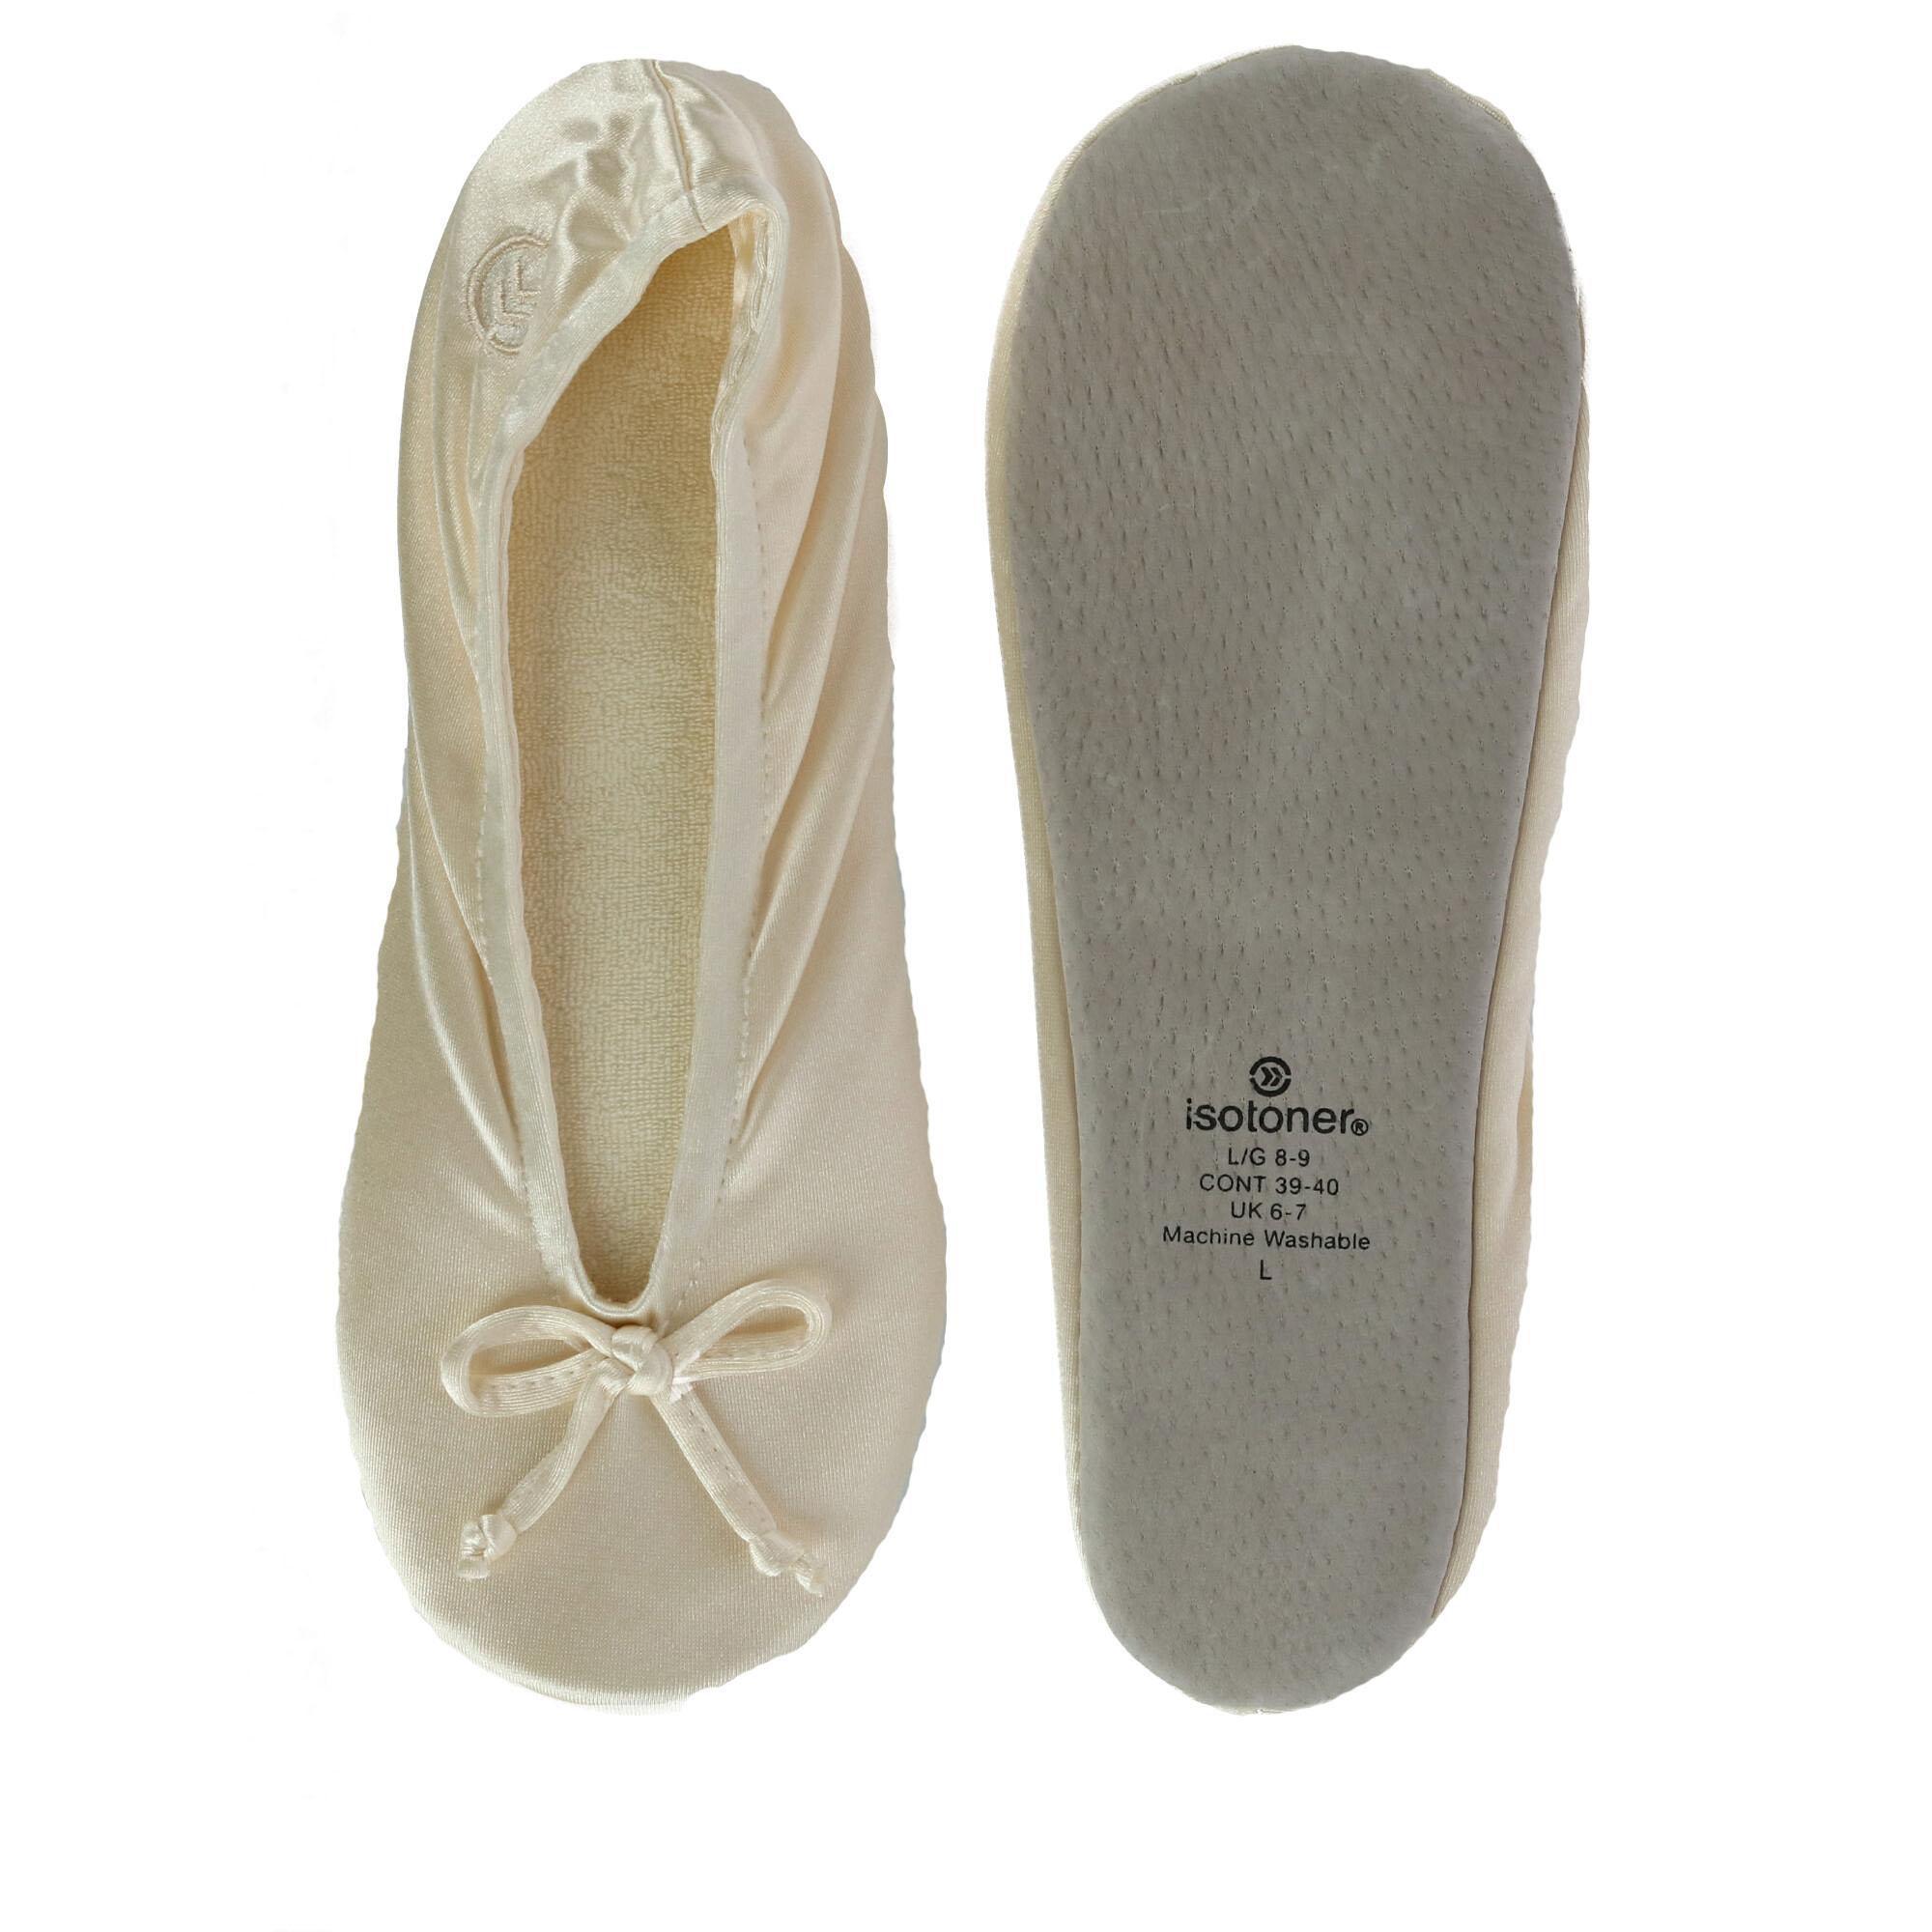 New Isotoner Women/'s Satin Classic Ballerina Slippers